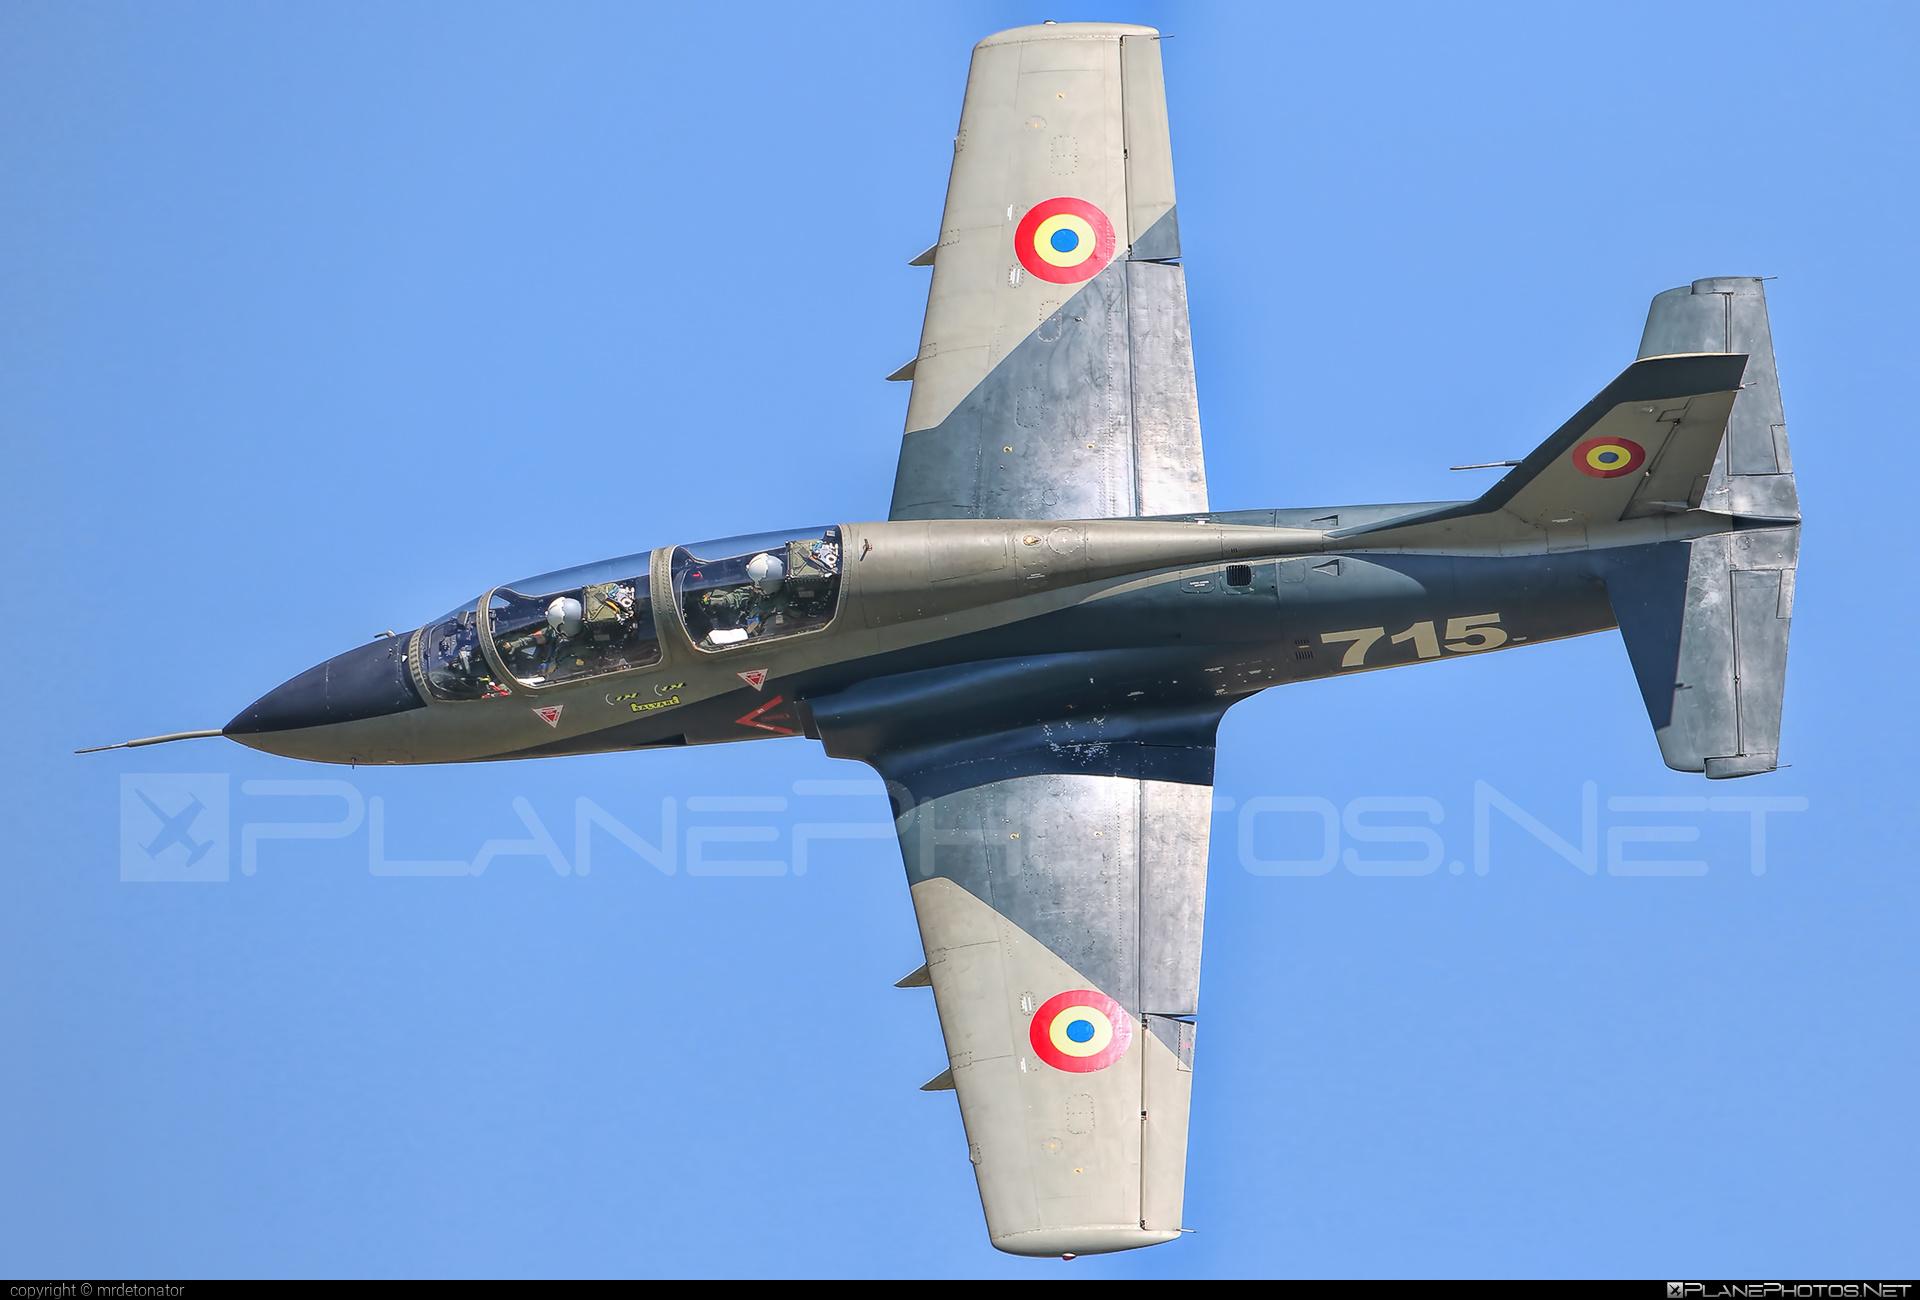 IAR IAR-99 Șoim - 715 operated by Forţele Aeriene Române (Romanian Air Force) #forteleaerieneromane #romanianairforce